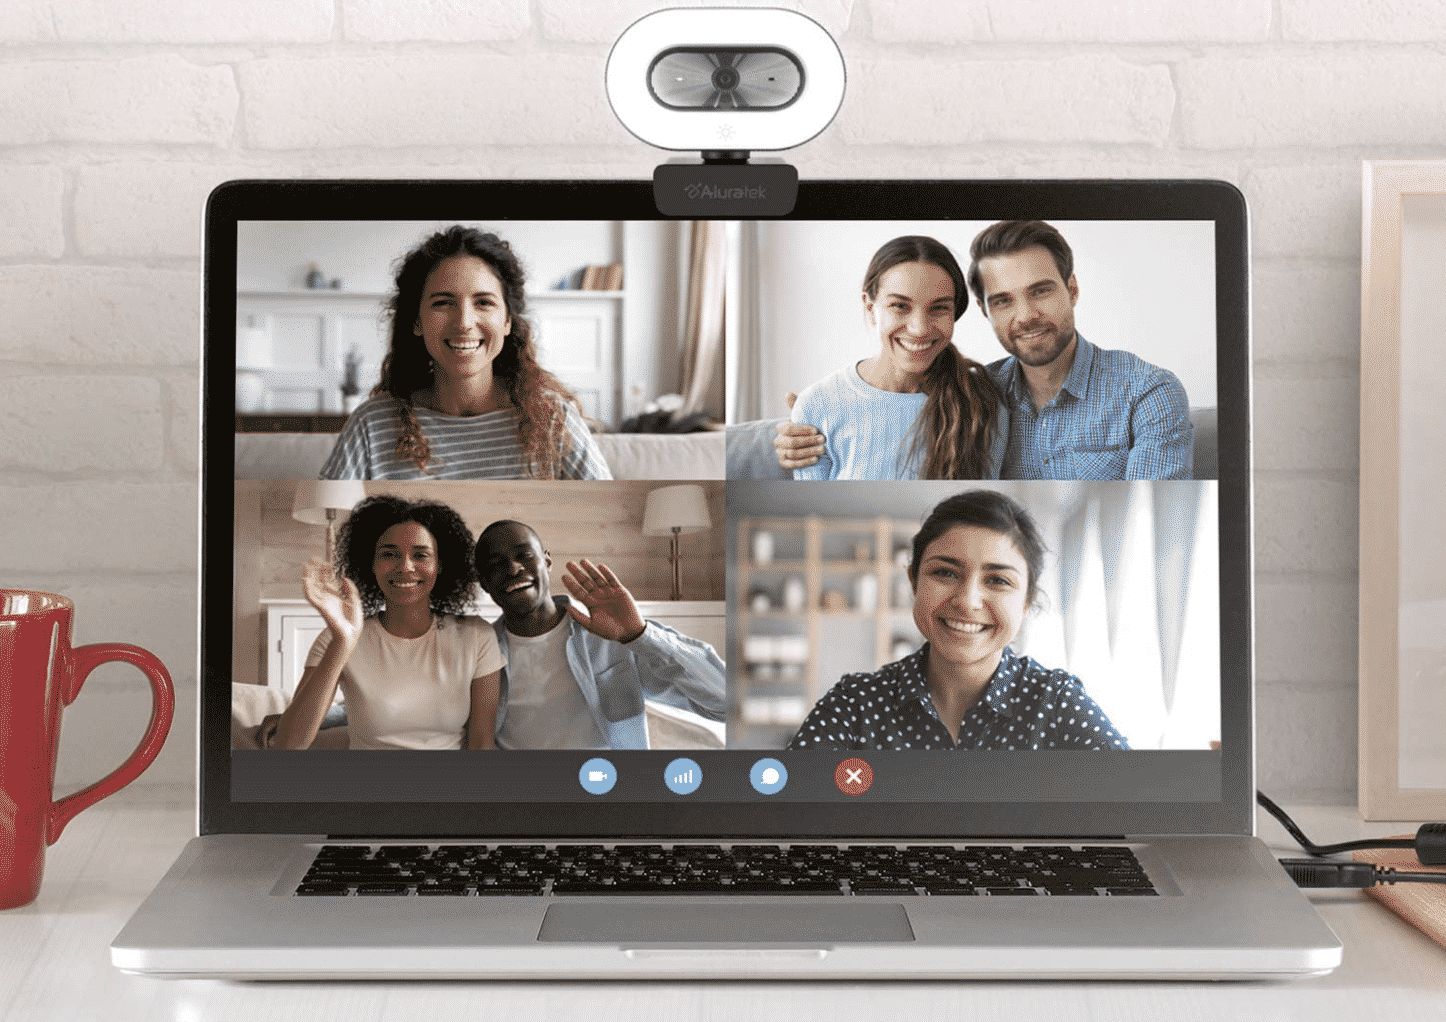 Aluratek Full HD 1080P USB Webcam